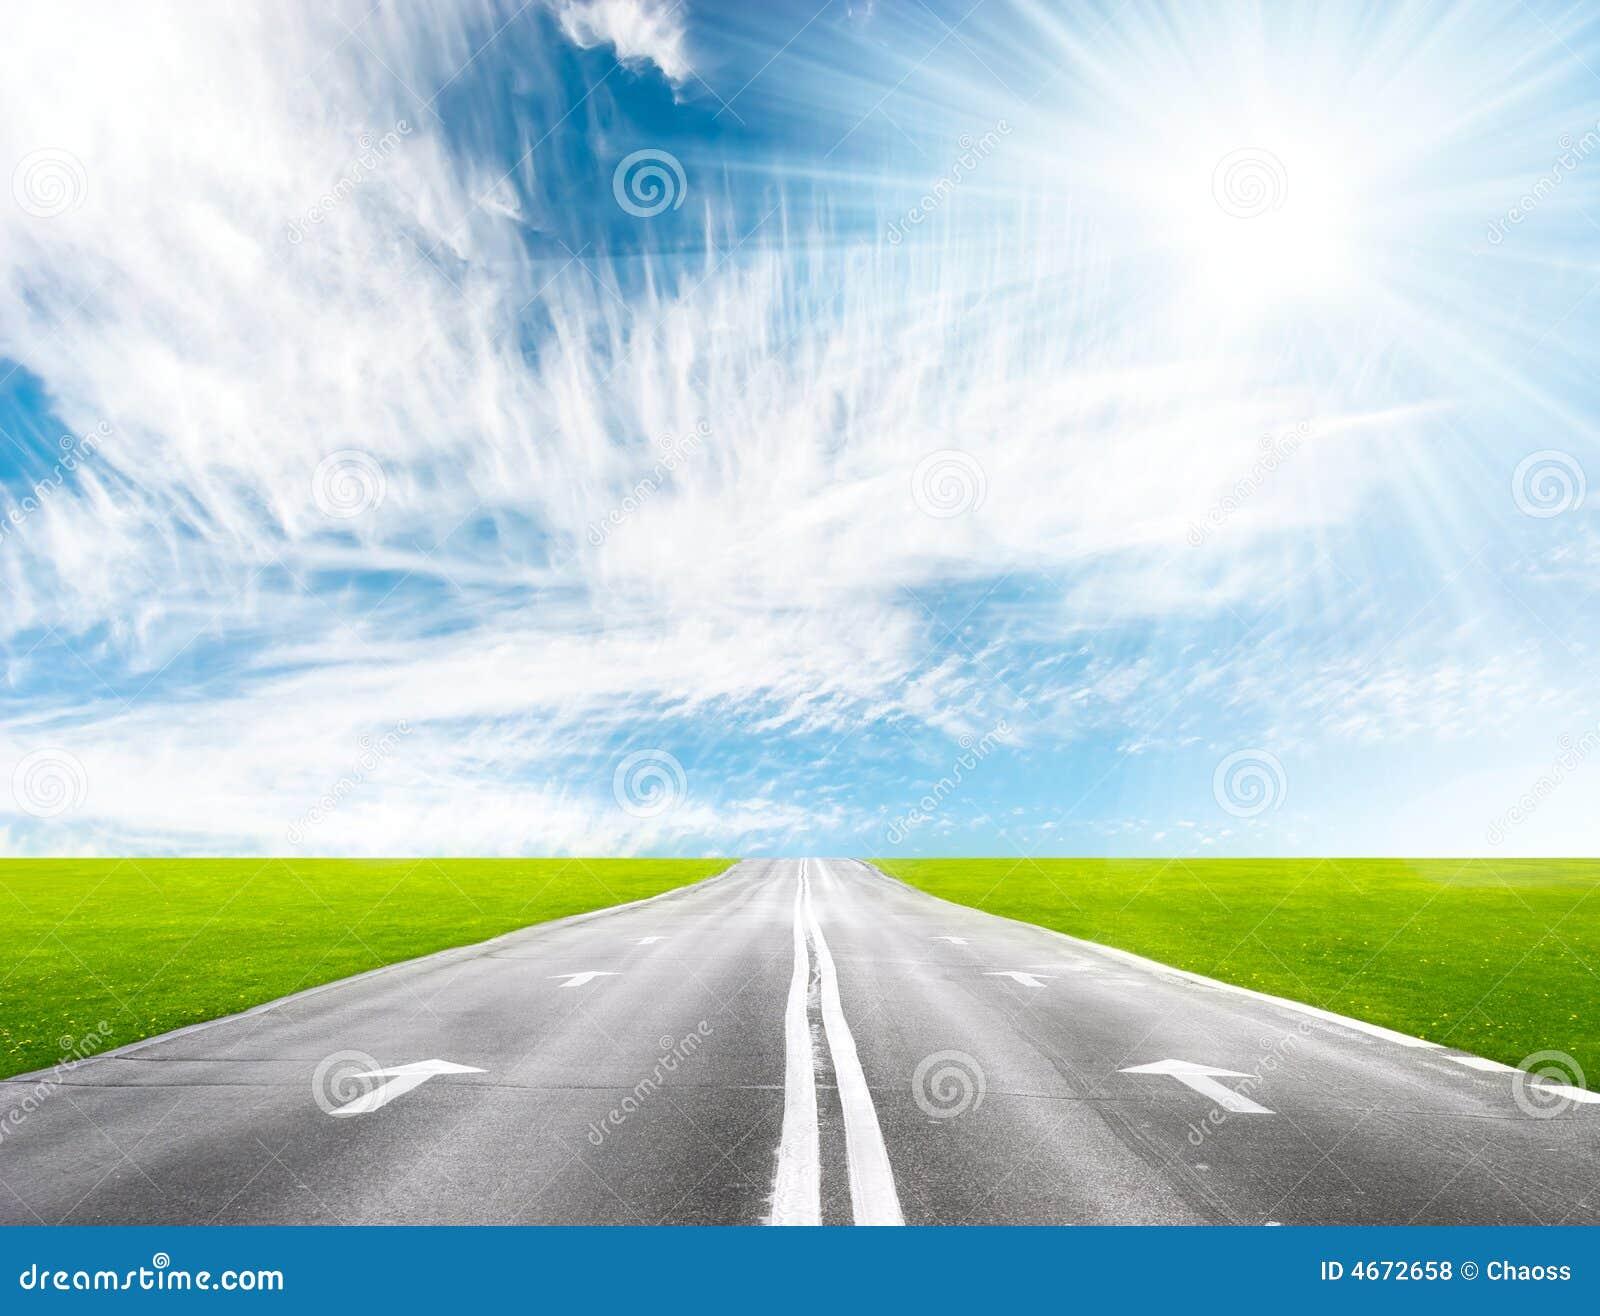 дорога перспективы